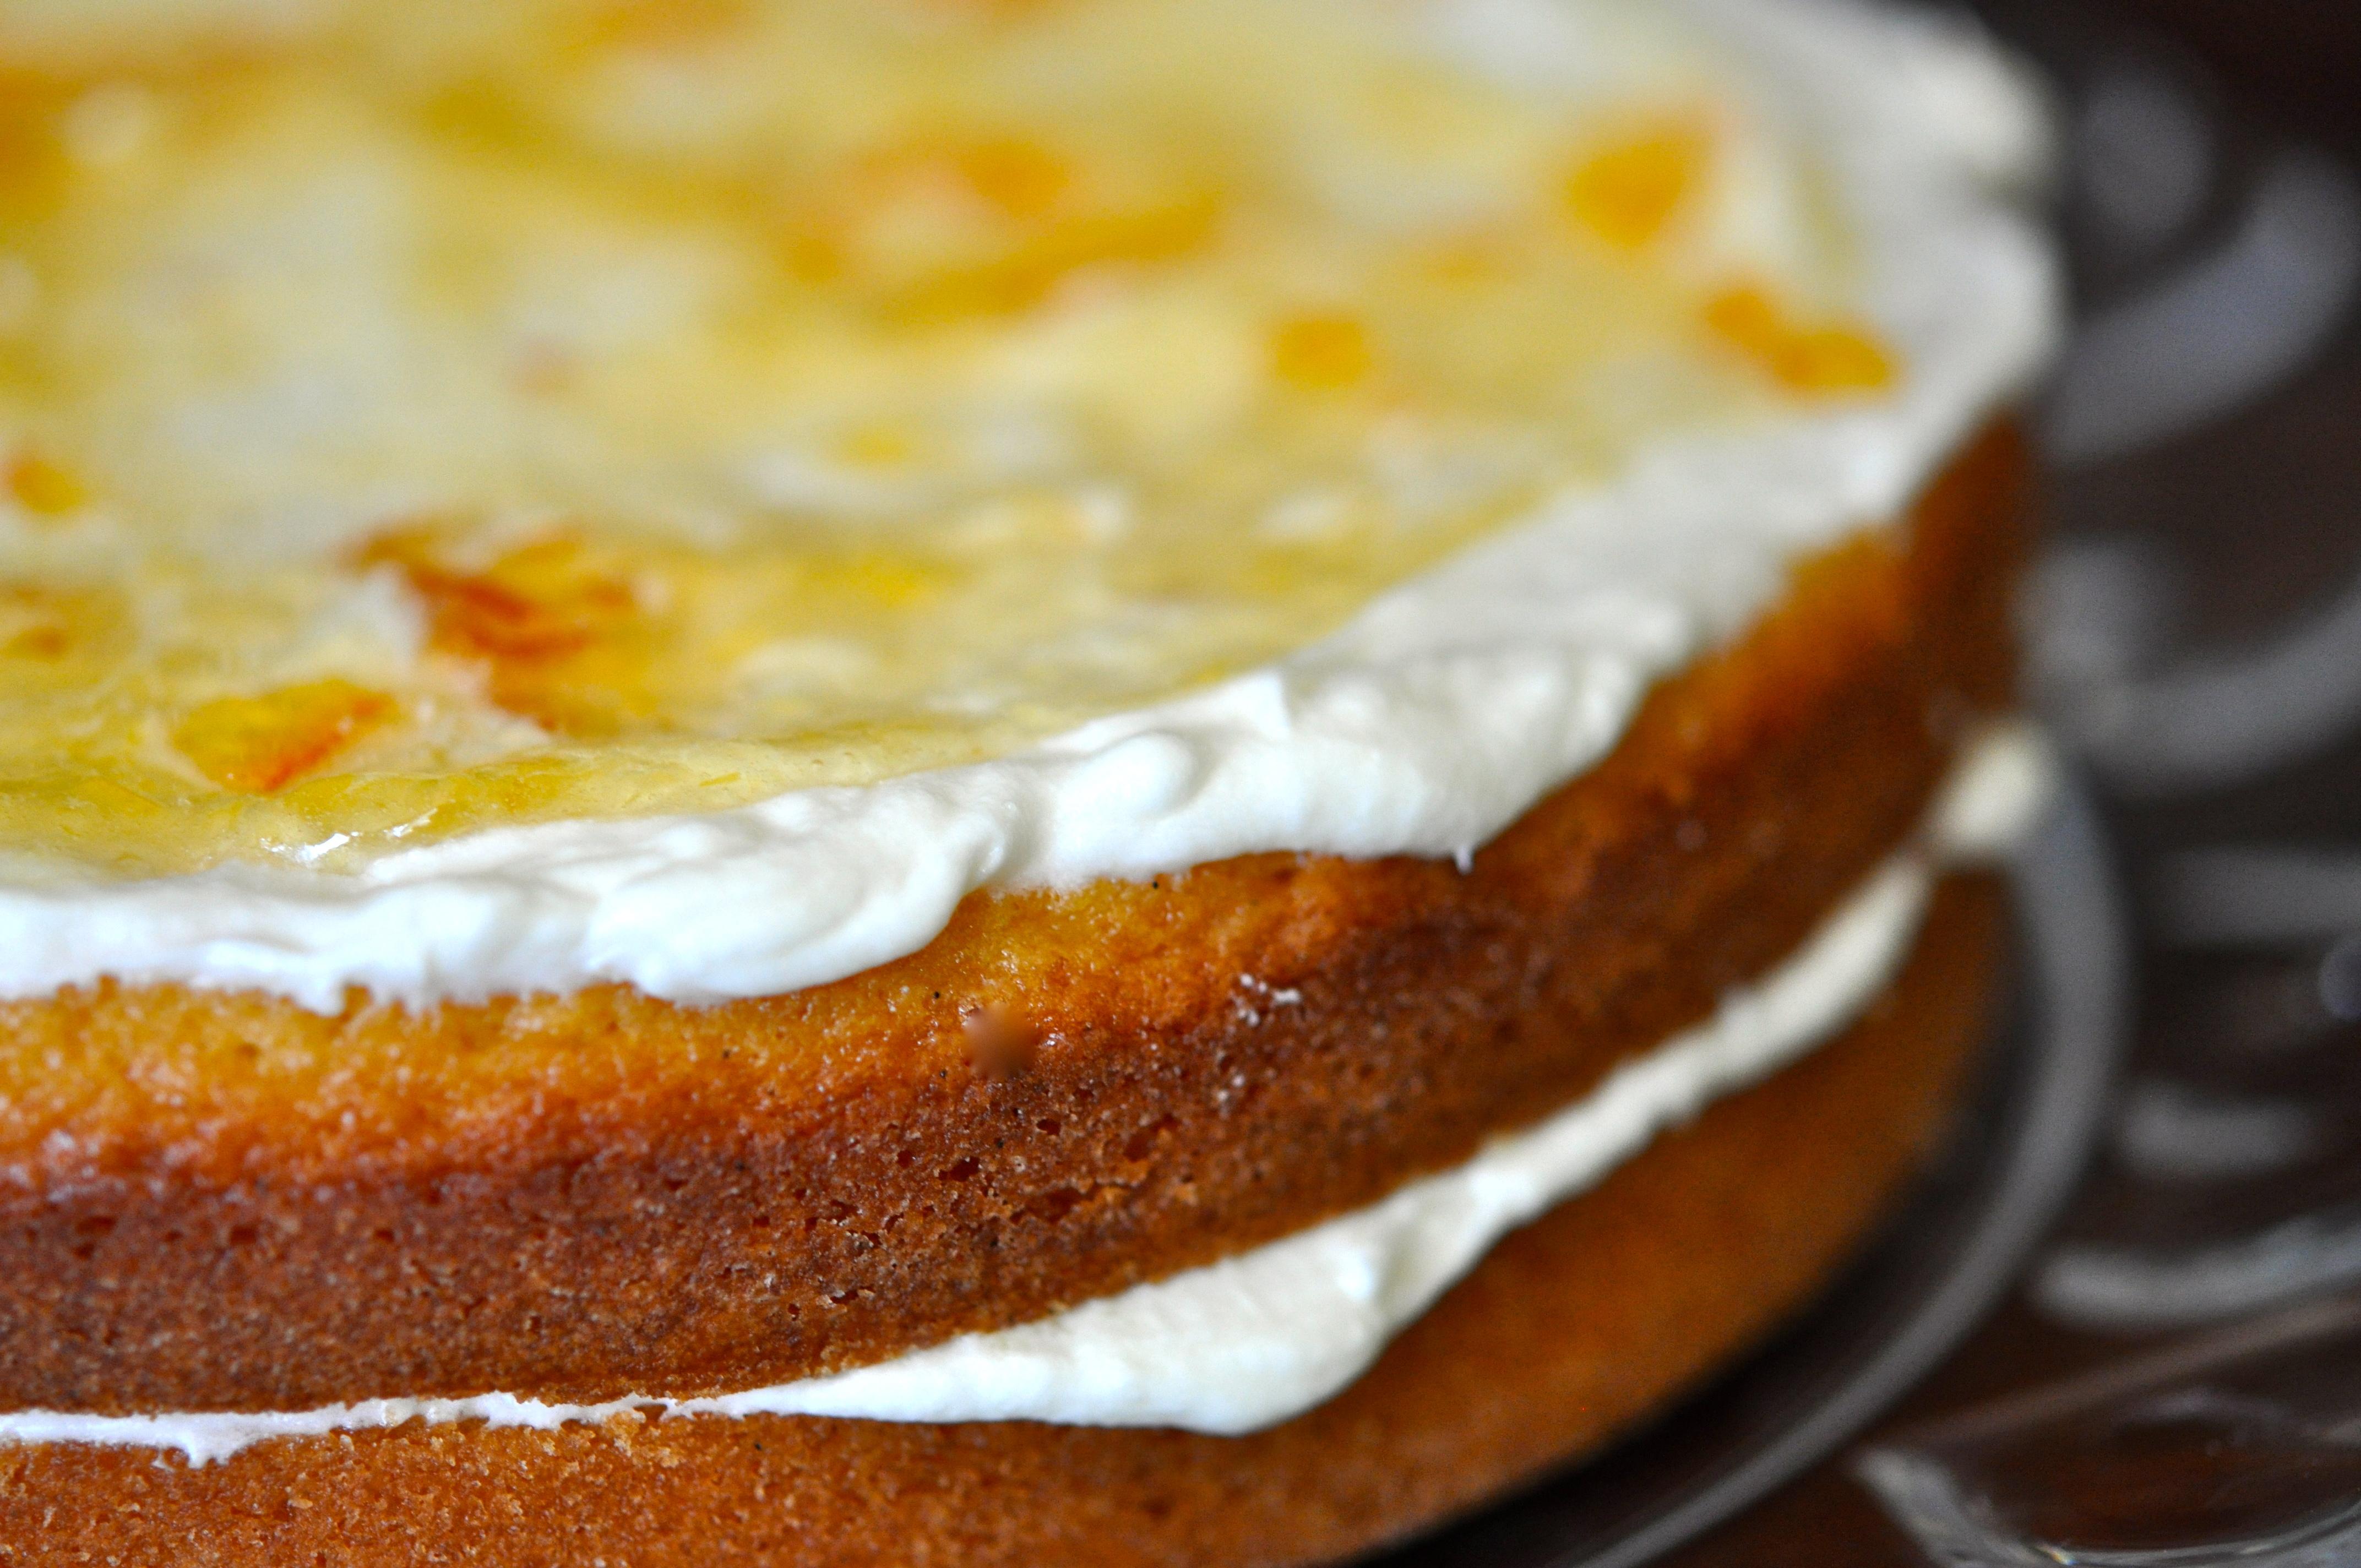 marmalade yoghurt cake yogurt marmalade cake marmalade yoghurt cake ...